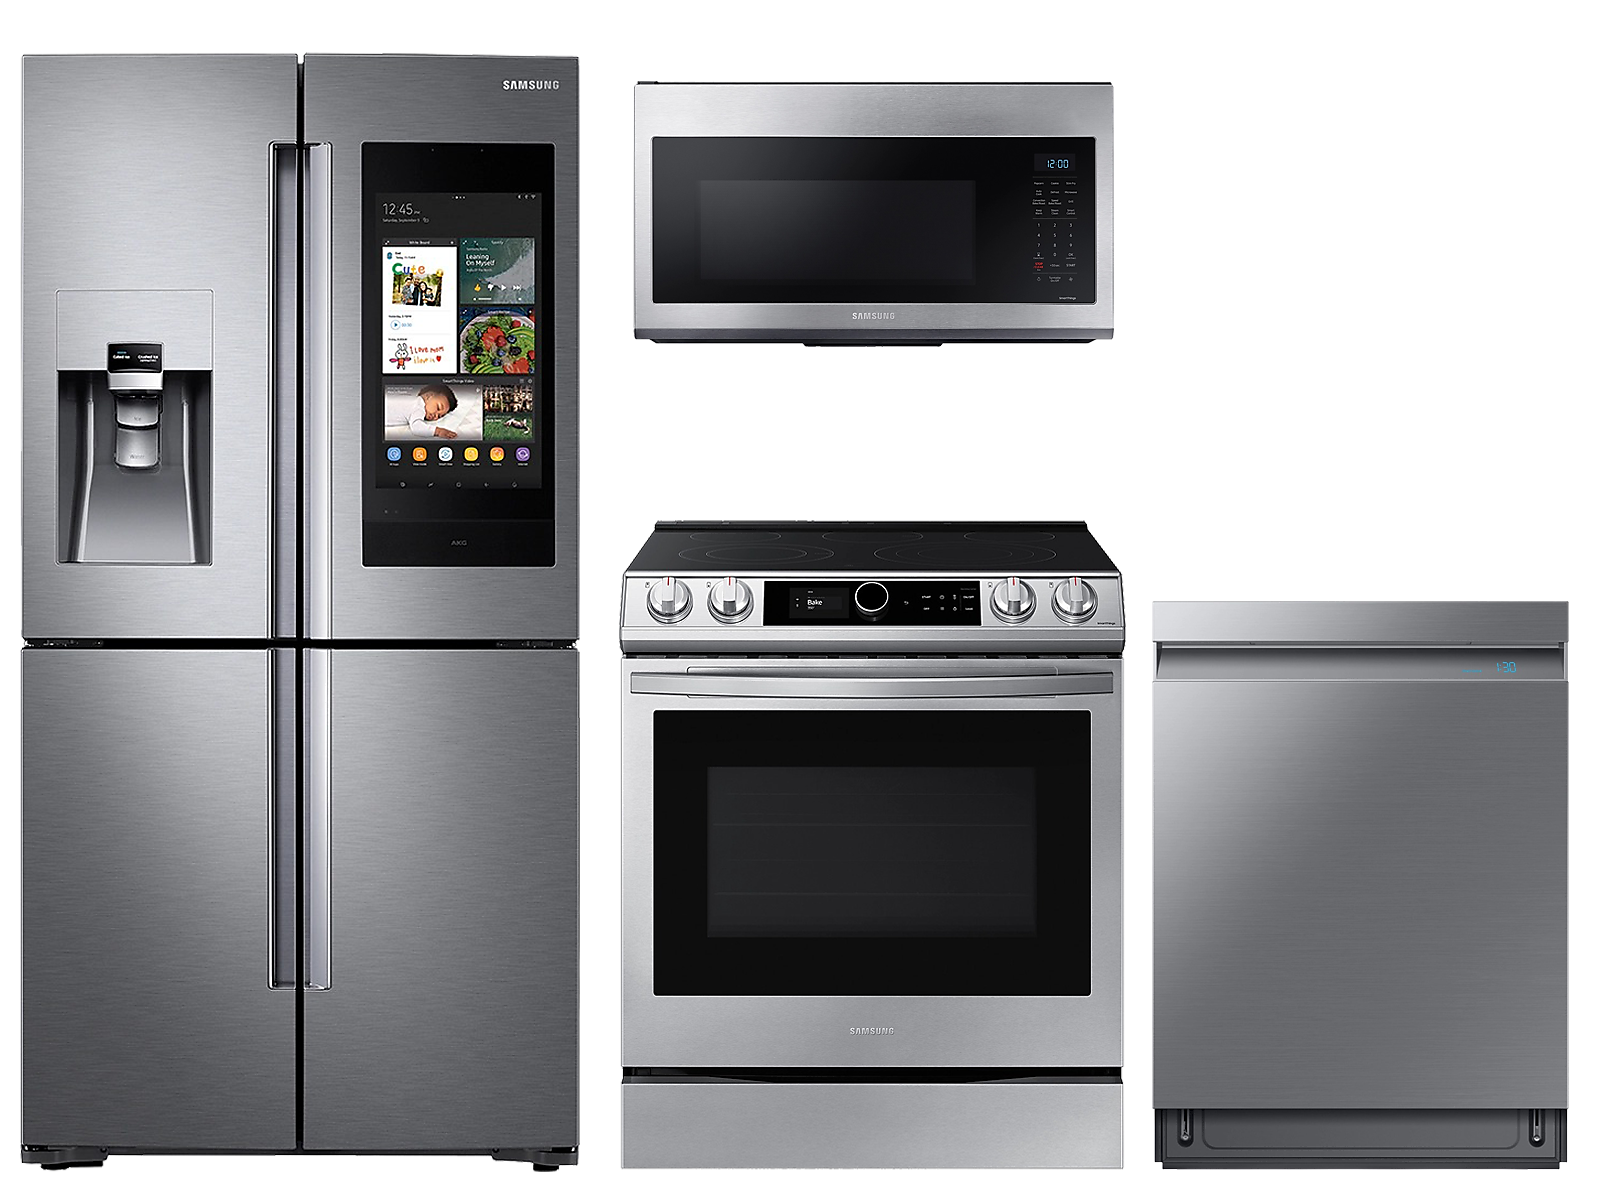 Samsung coupon: Samsung 22 cu. ft. Family HubTM counter depth 4-door refrigerator, 6.3 cu. ft. electric range, microwave and Smart Linear dishwasher package